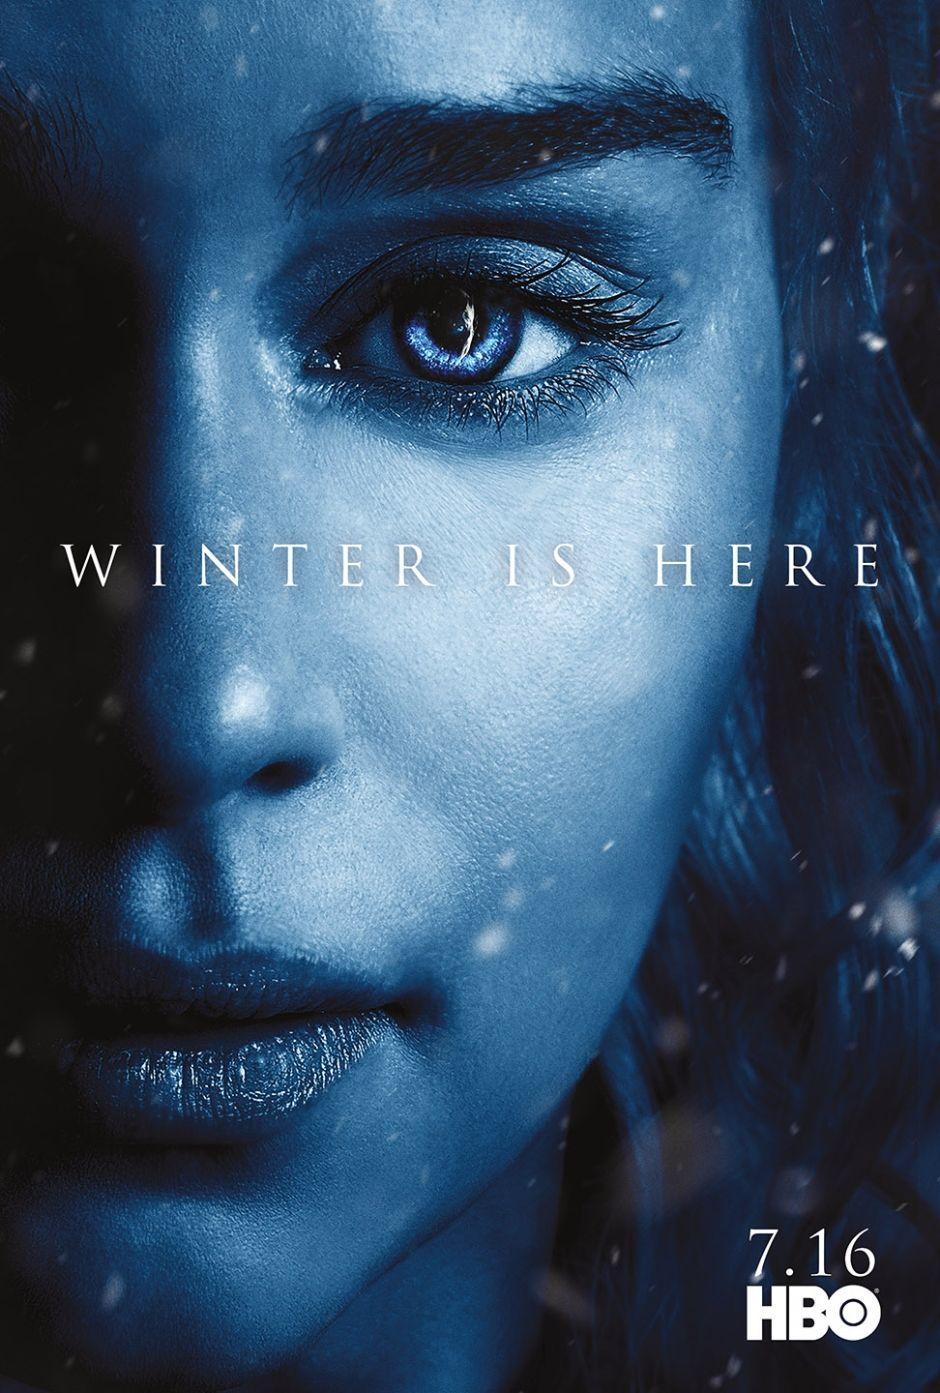 Hbo S Game Of Thrones Season 7 Promotional Image Daenerys Targaryen Jon Snow Game Of Thrones Winter Game Of Thrones Poster Hbo